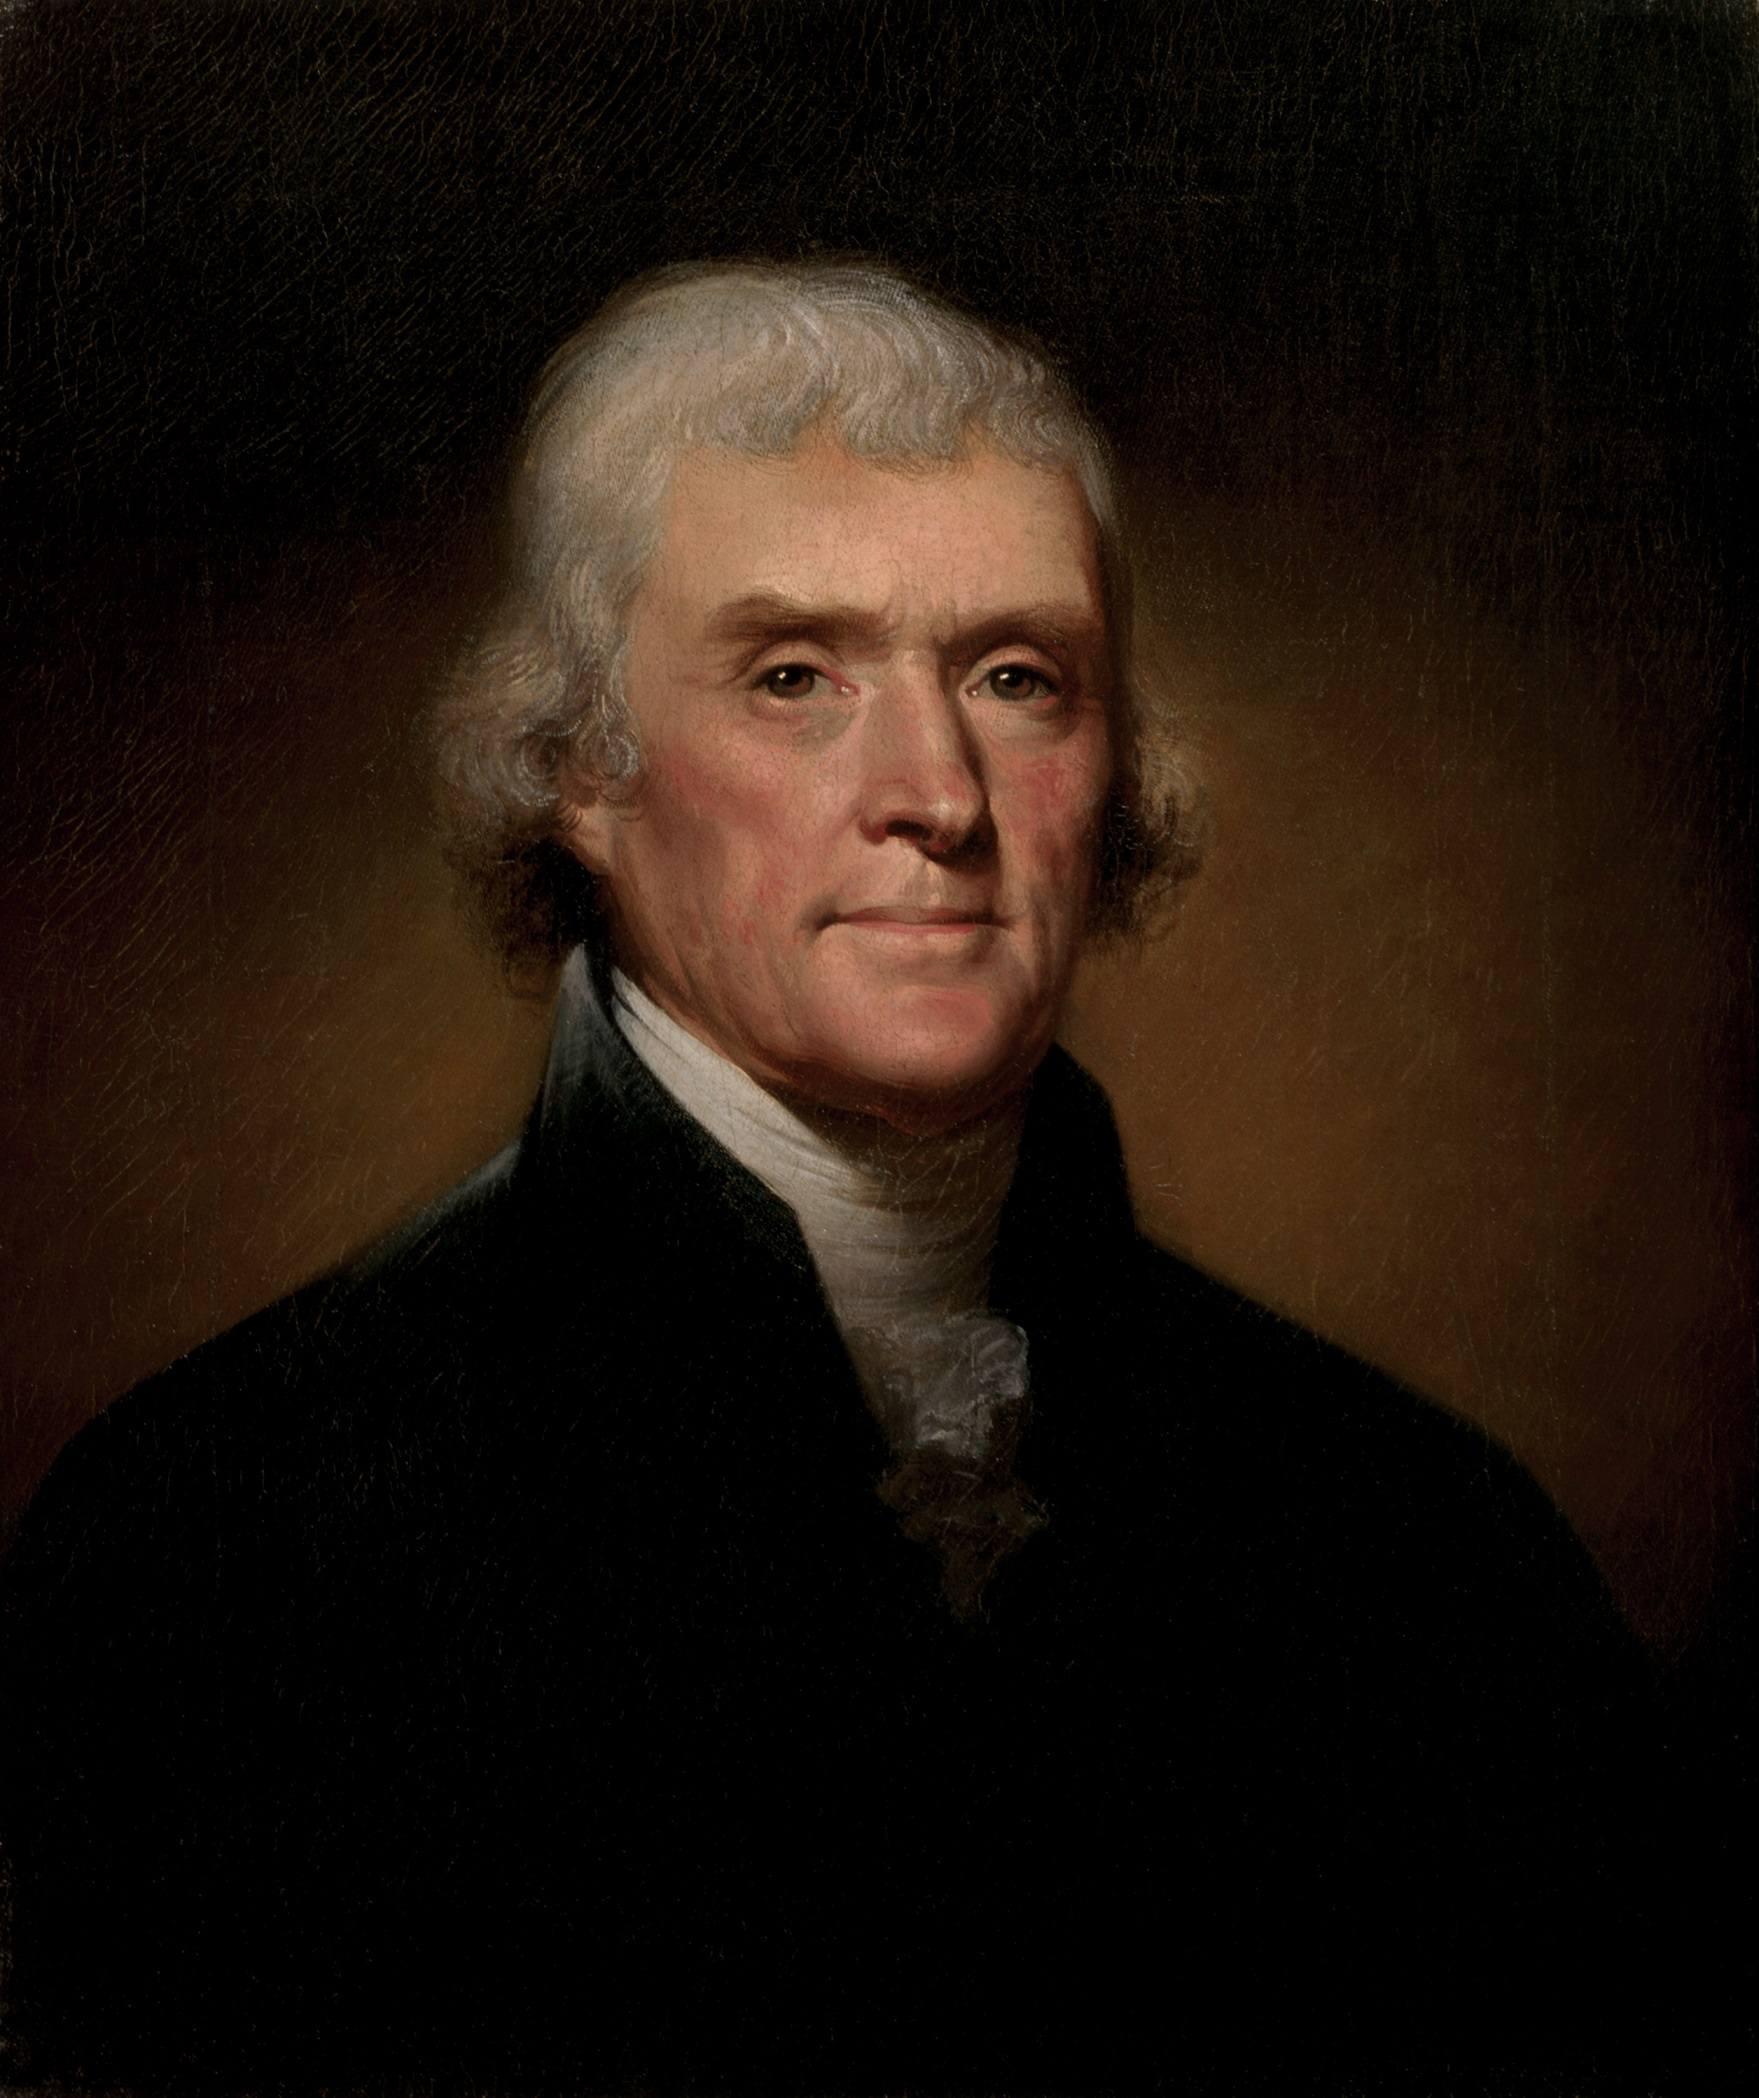 3rd President of the US Thomas Jefferson